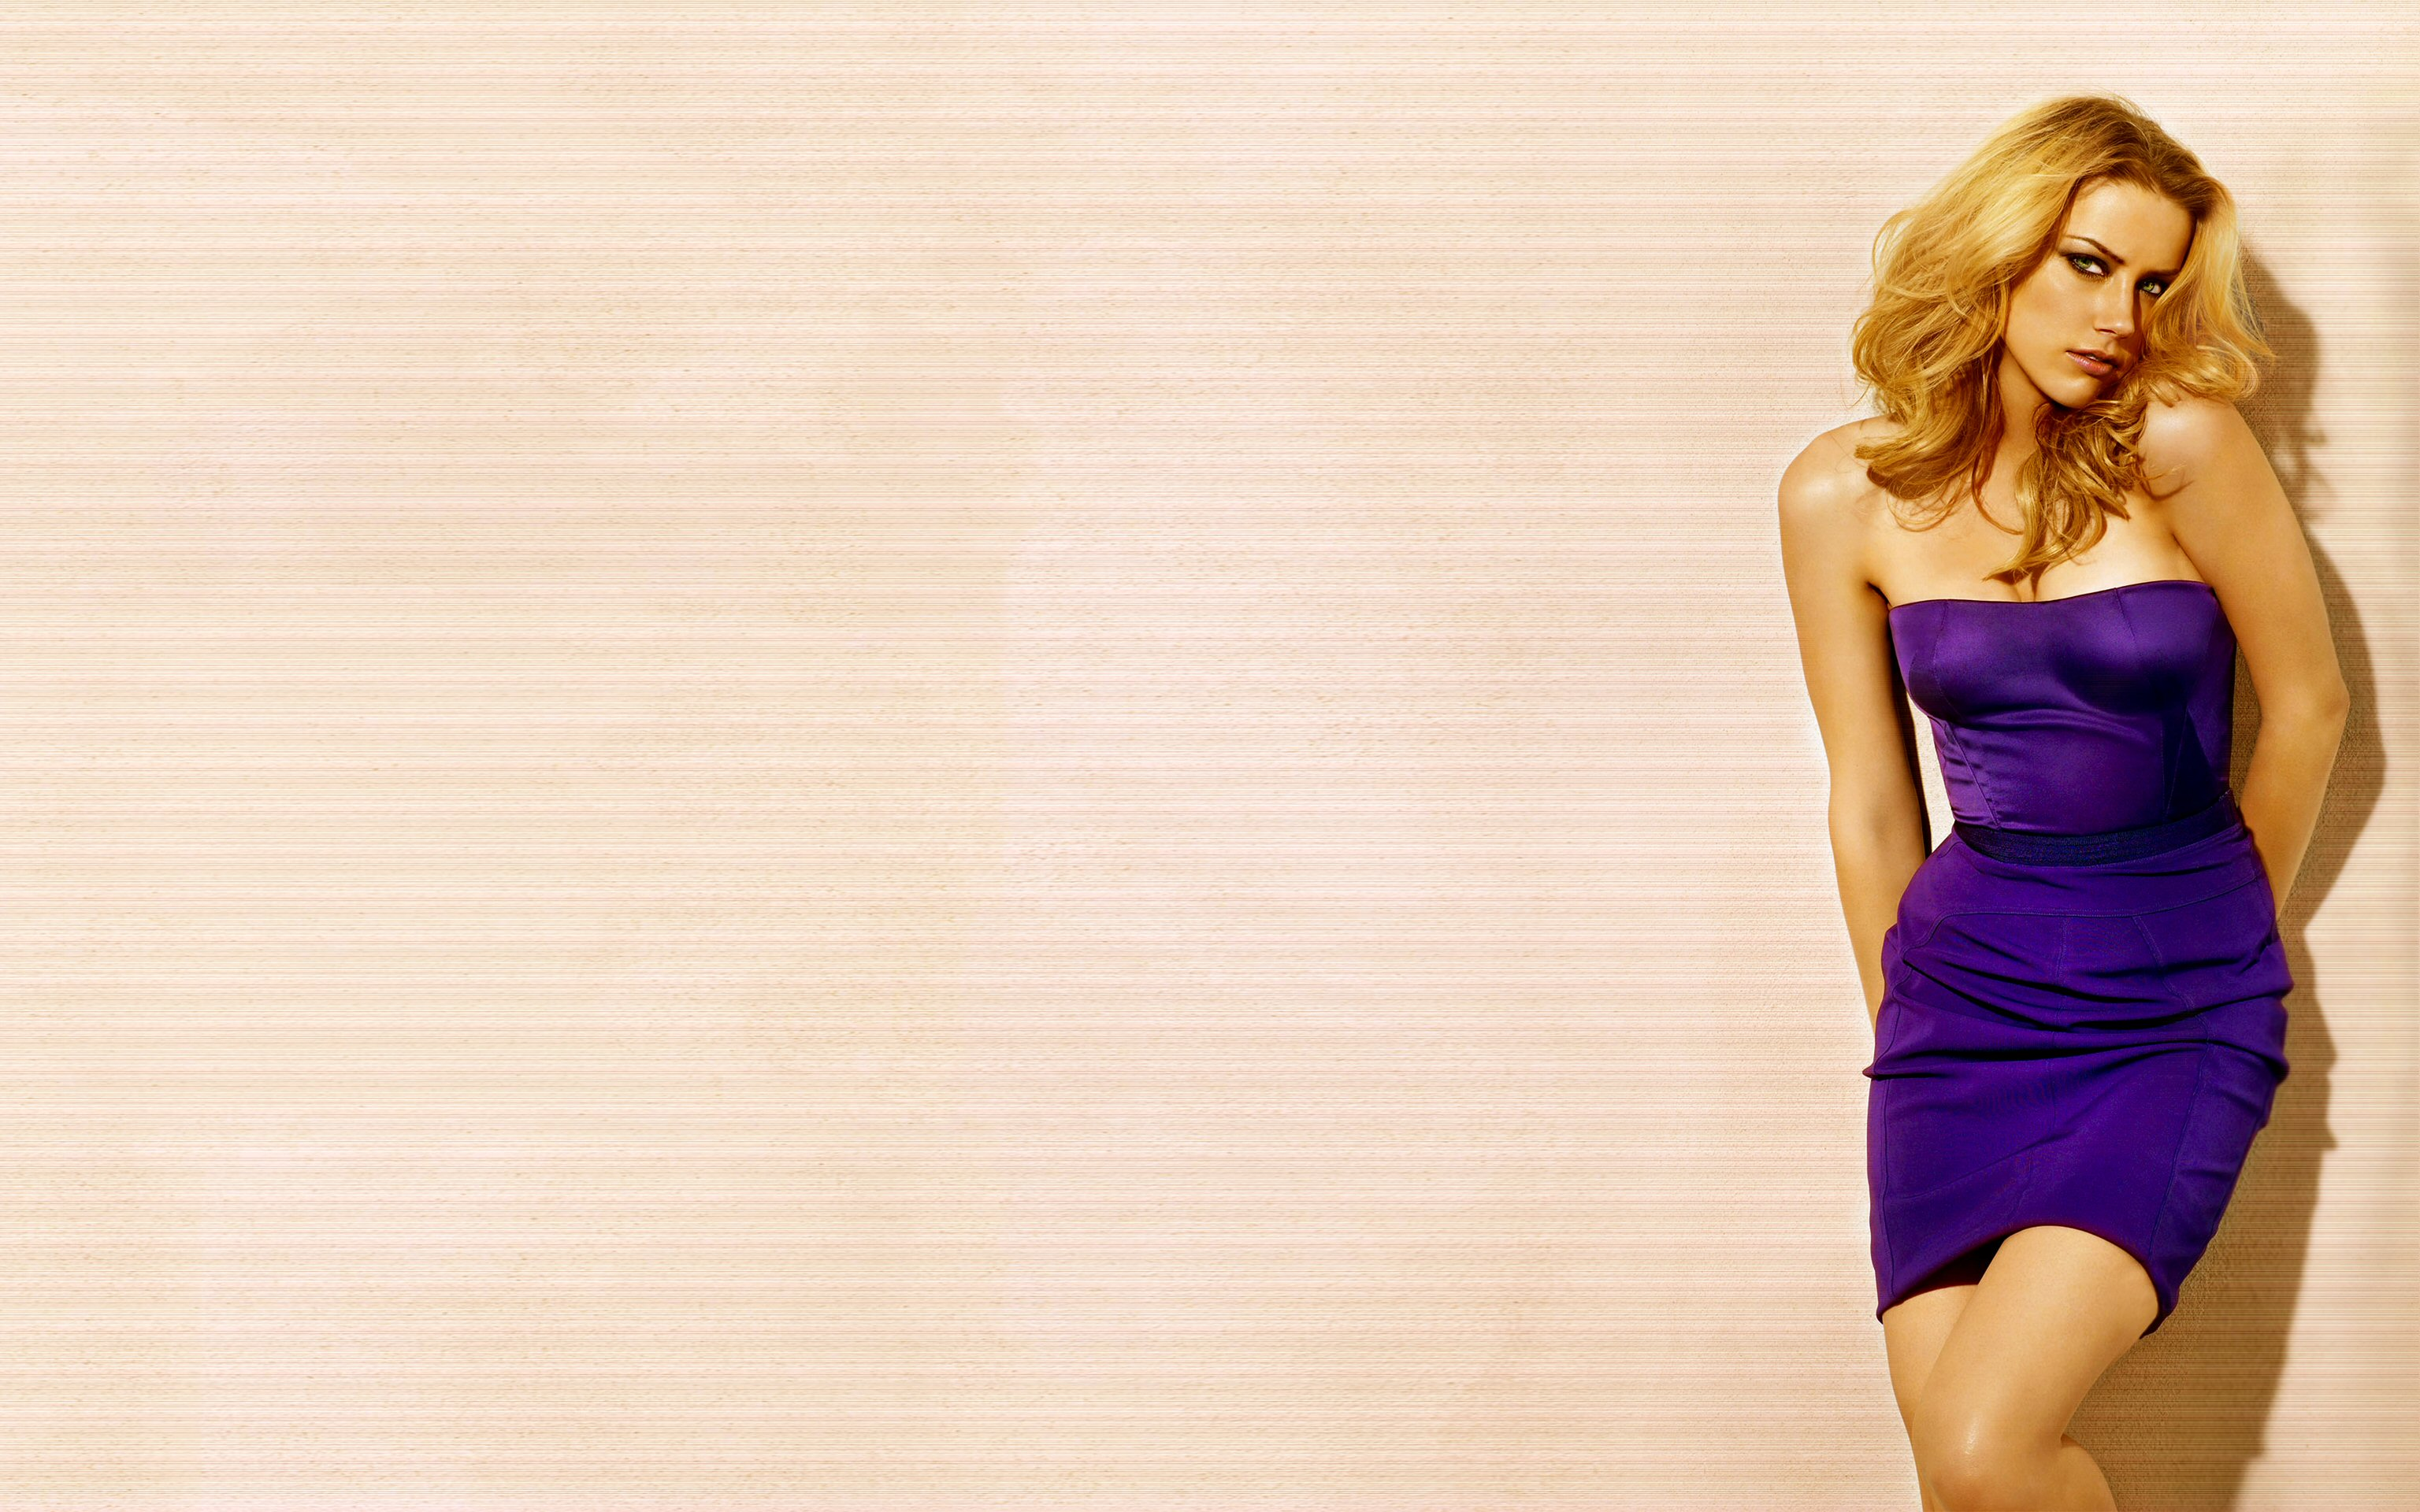 Screenshot: Celebrity - Amber Heard   Amber heard